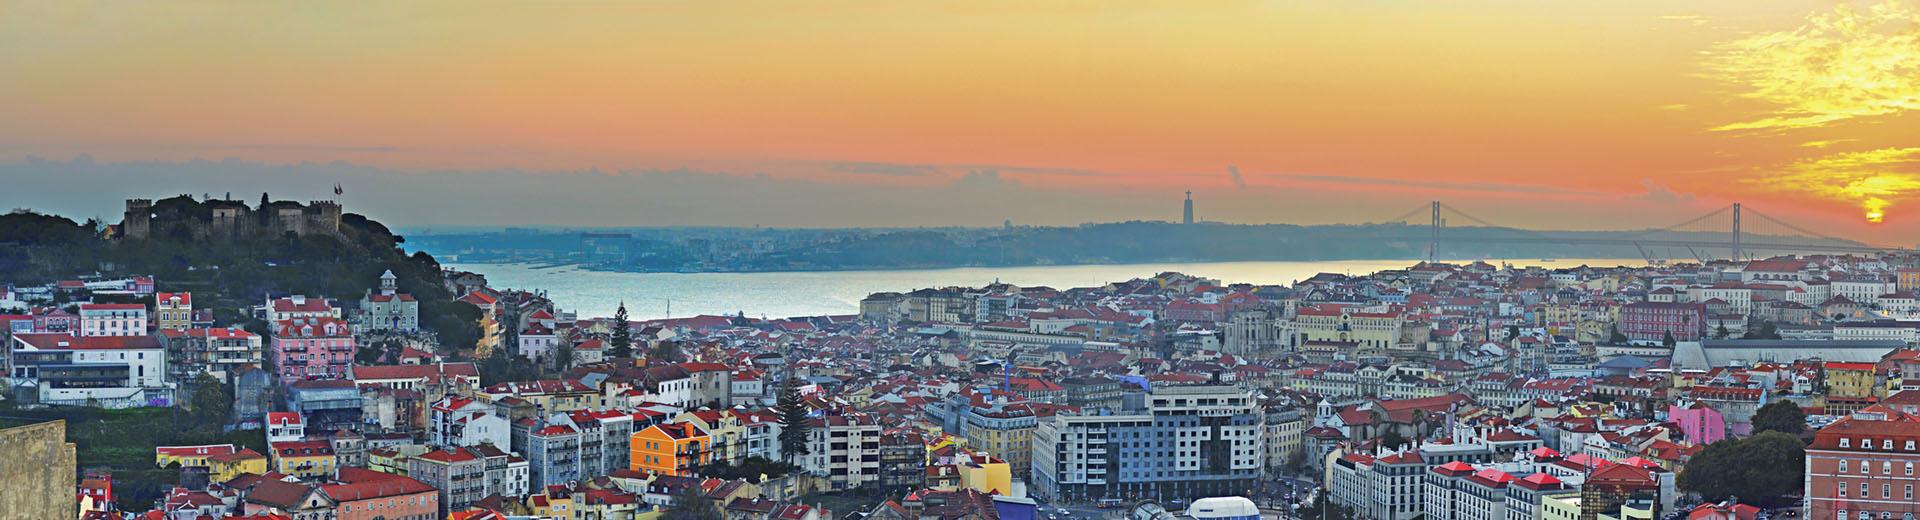 Gruppenreise Lissabon